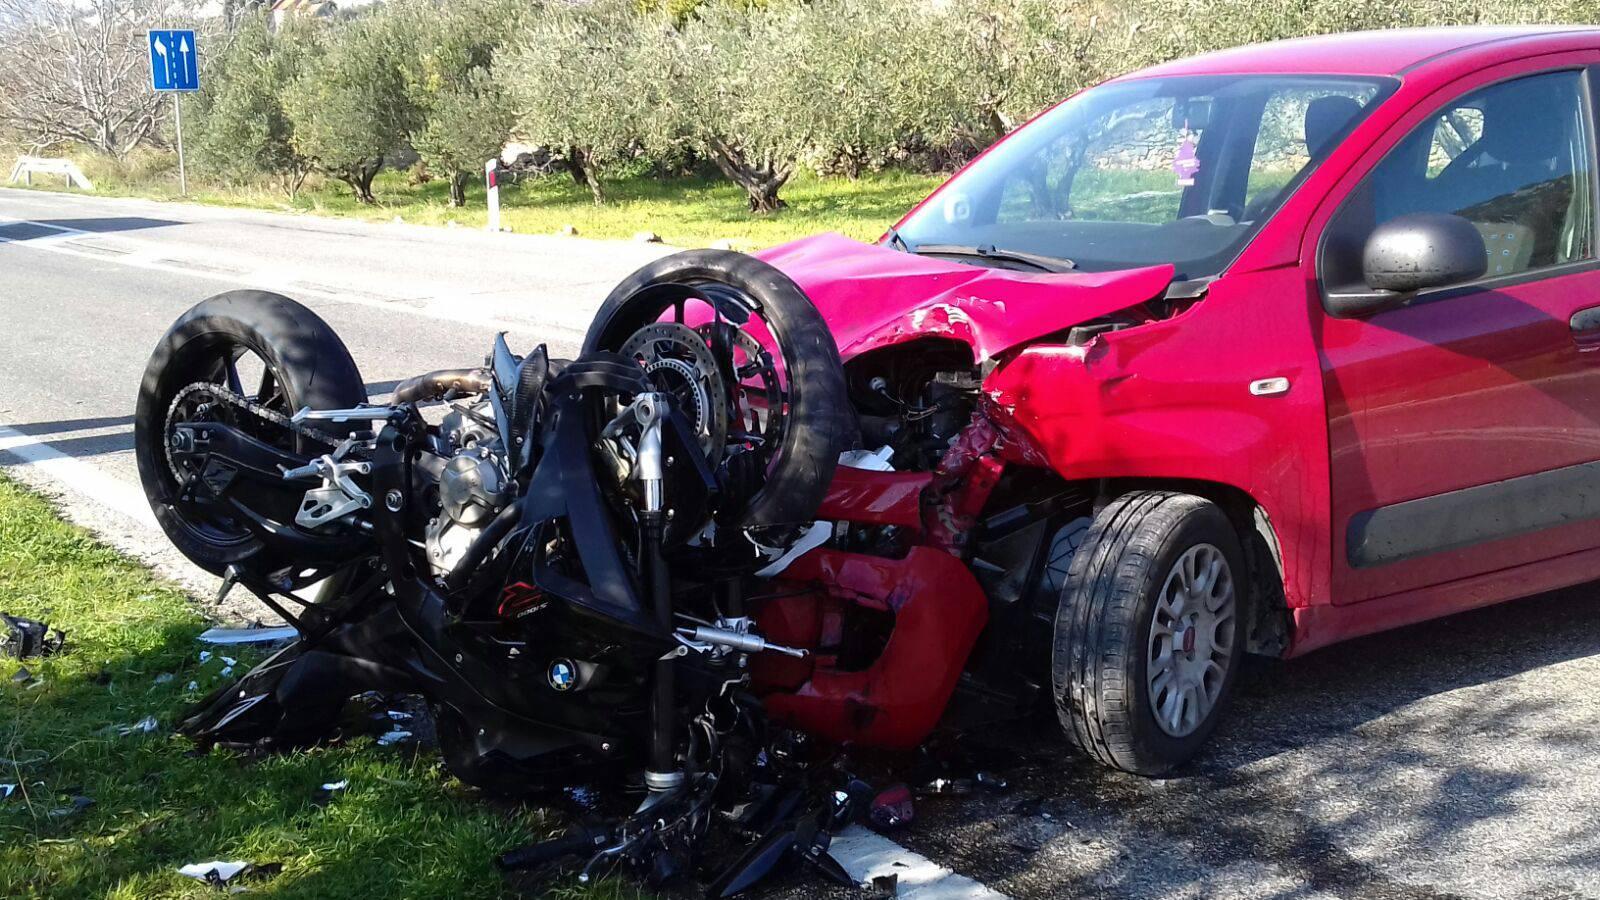 Sudarili su se auto i motocikl: Vozač motora (31) ozlijeđen